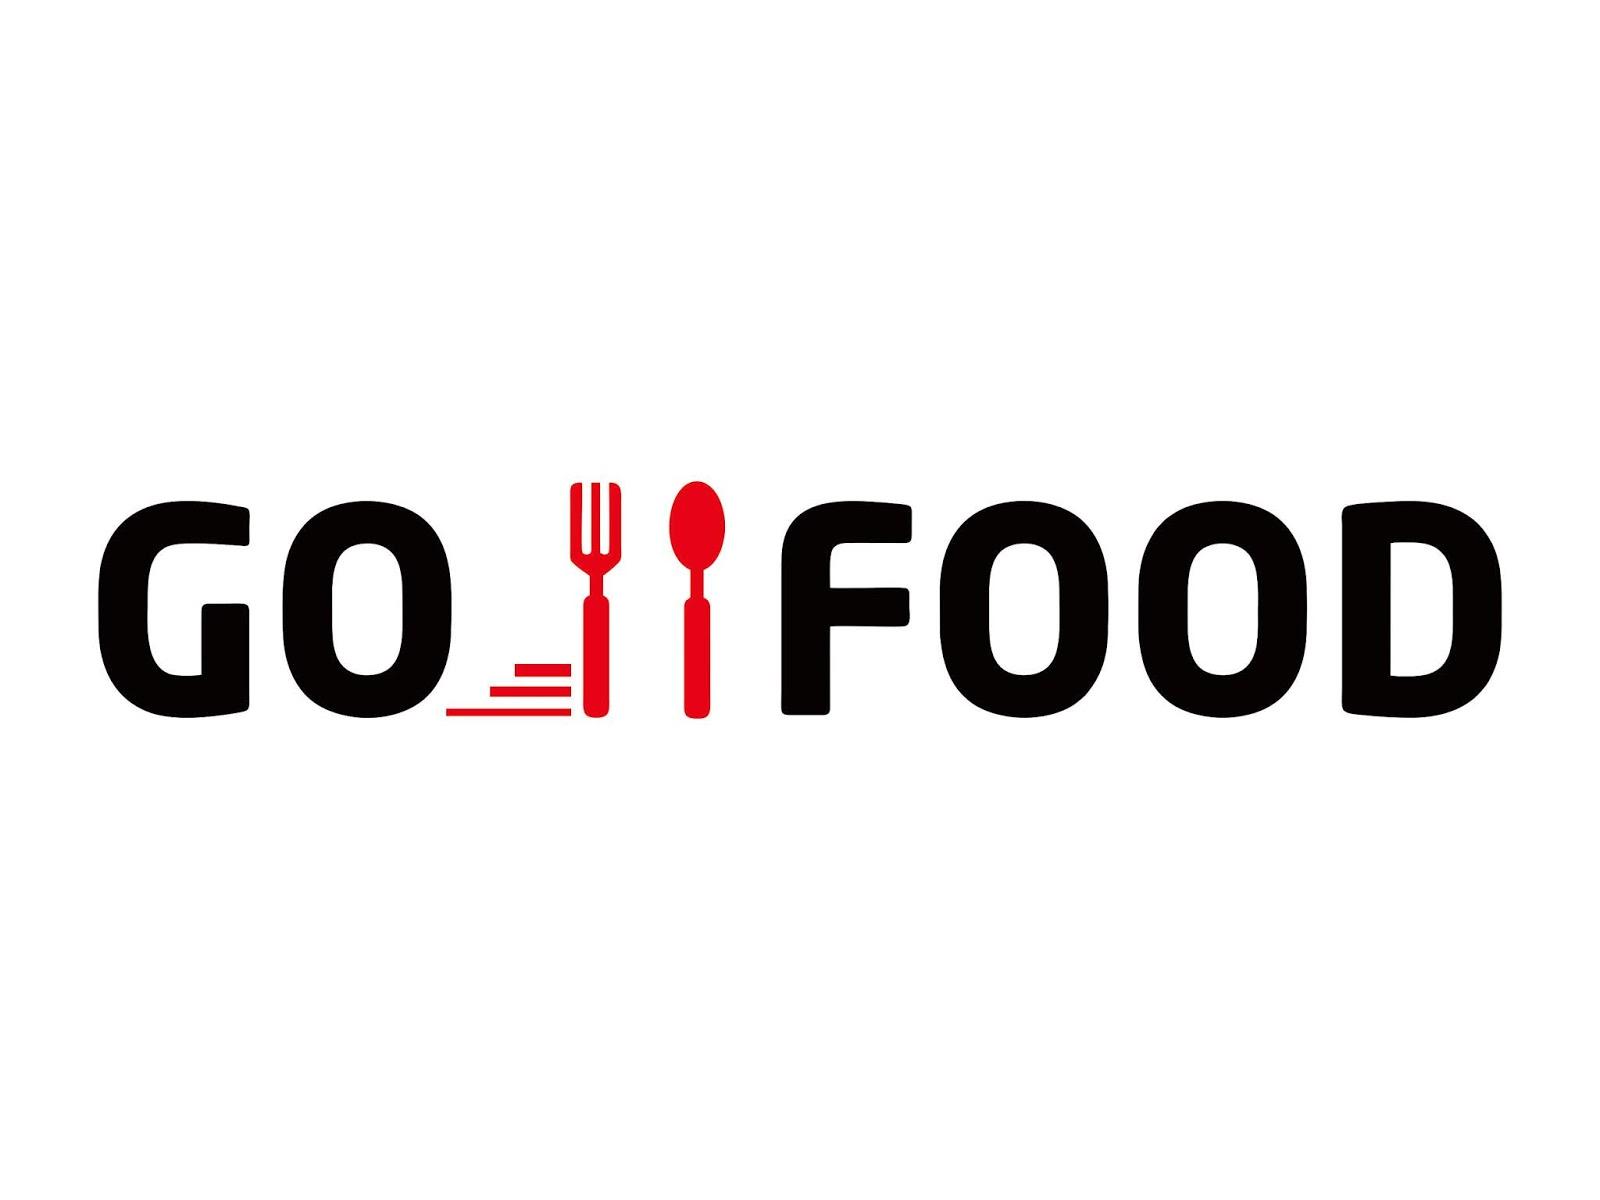 Go Food Png & Free Go Food.png Transparent Images #3745.